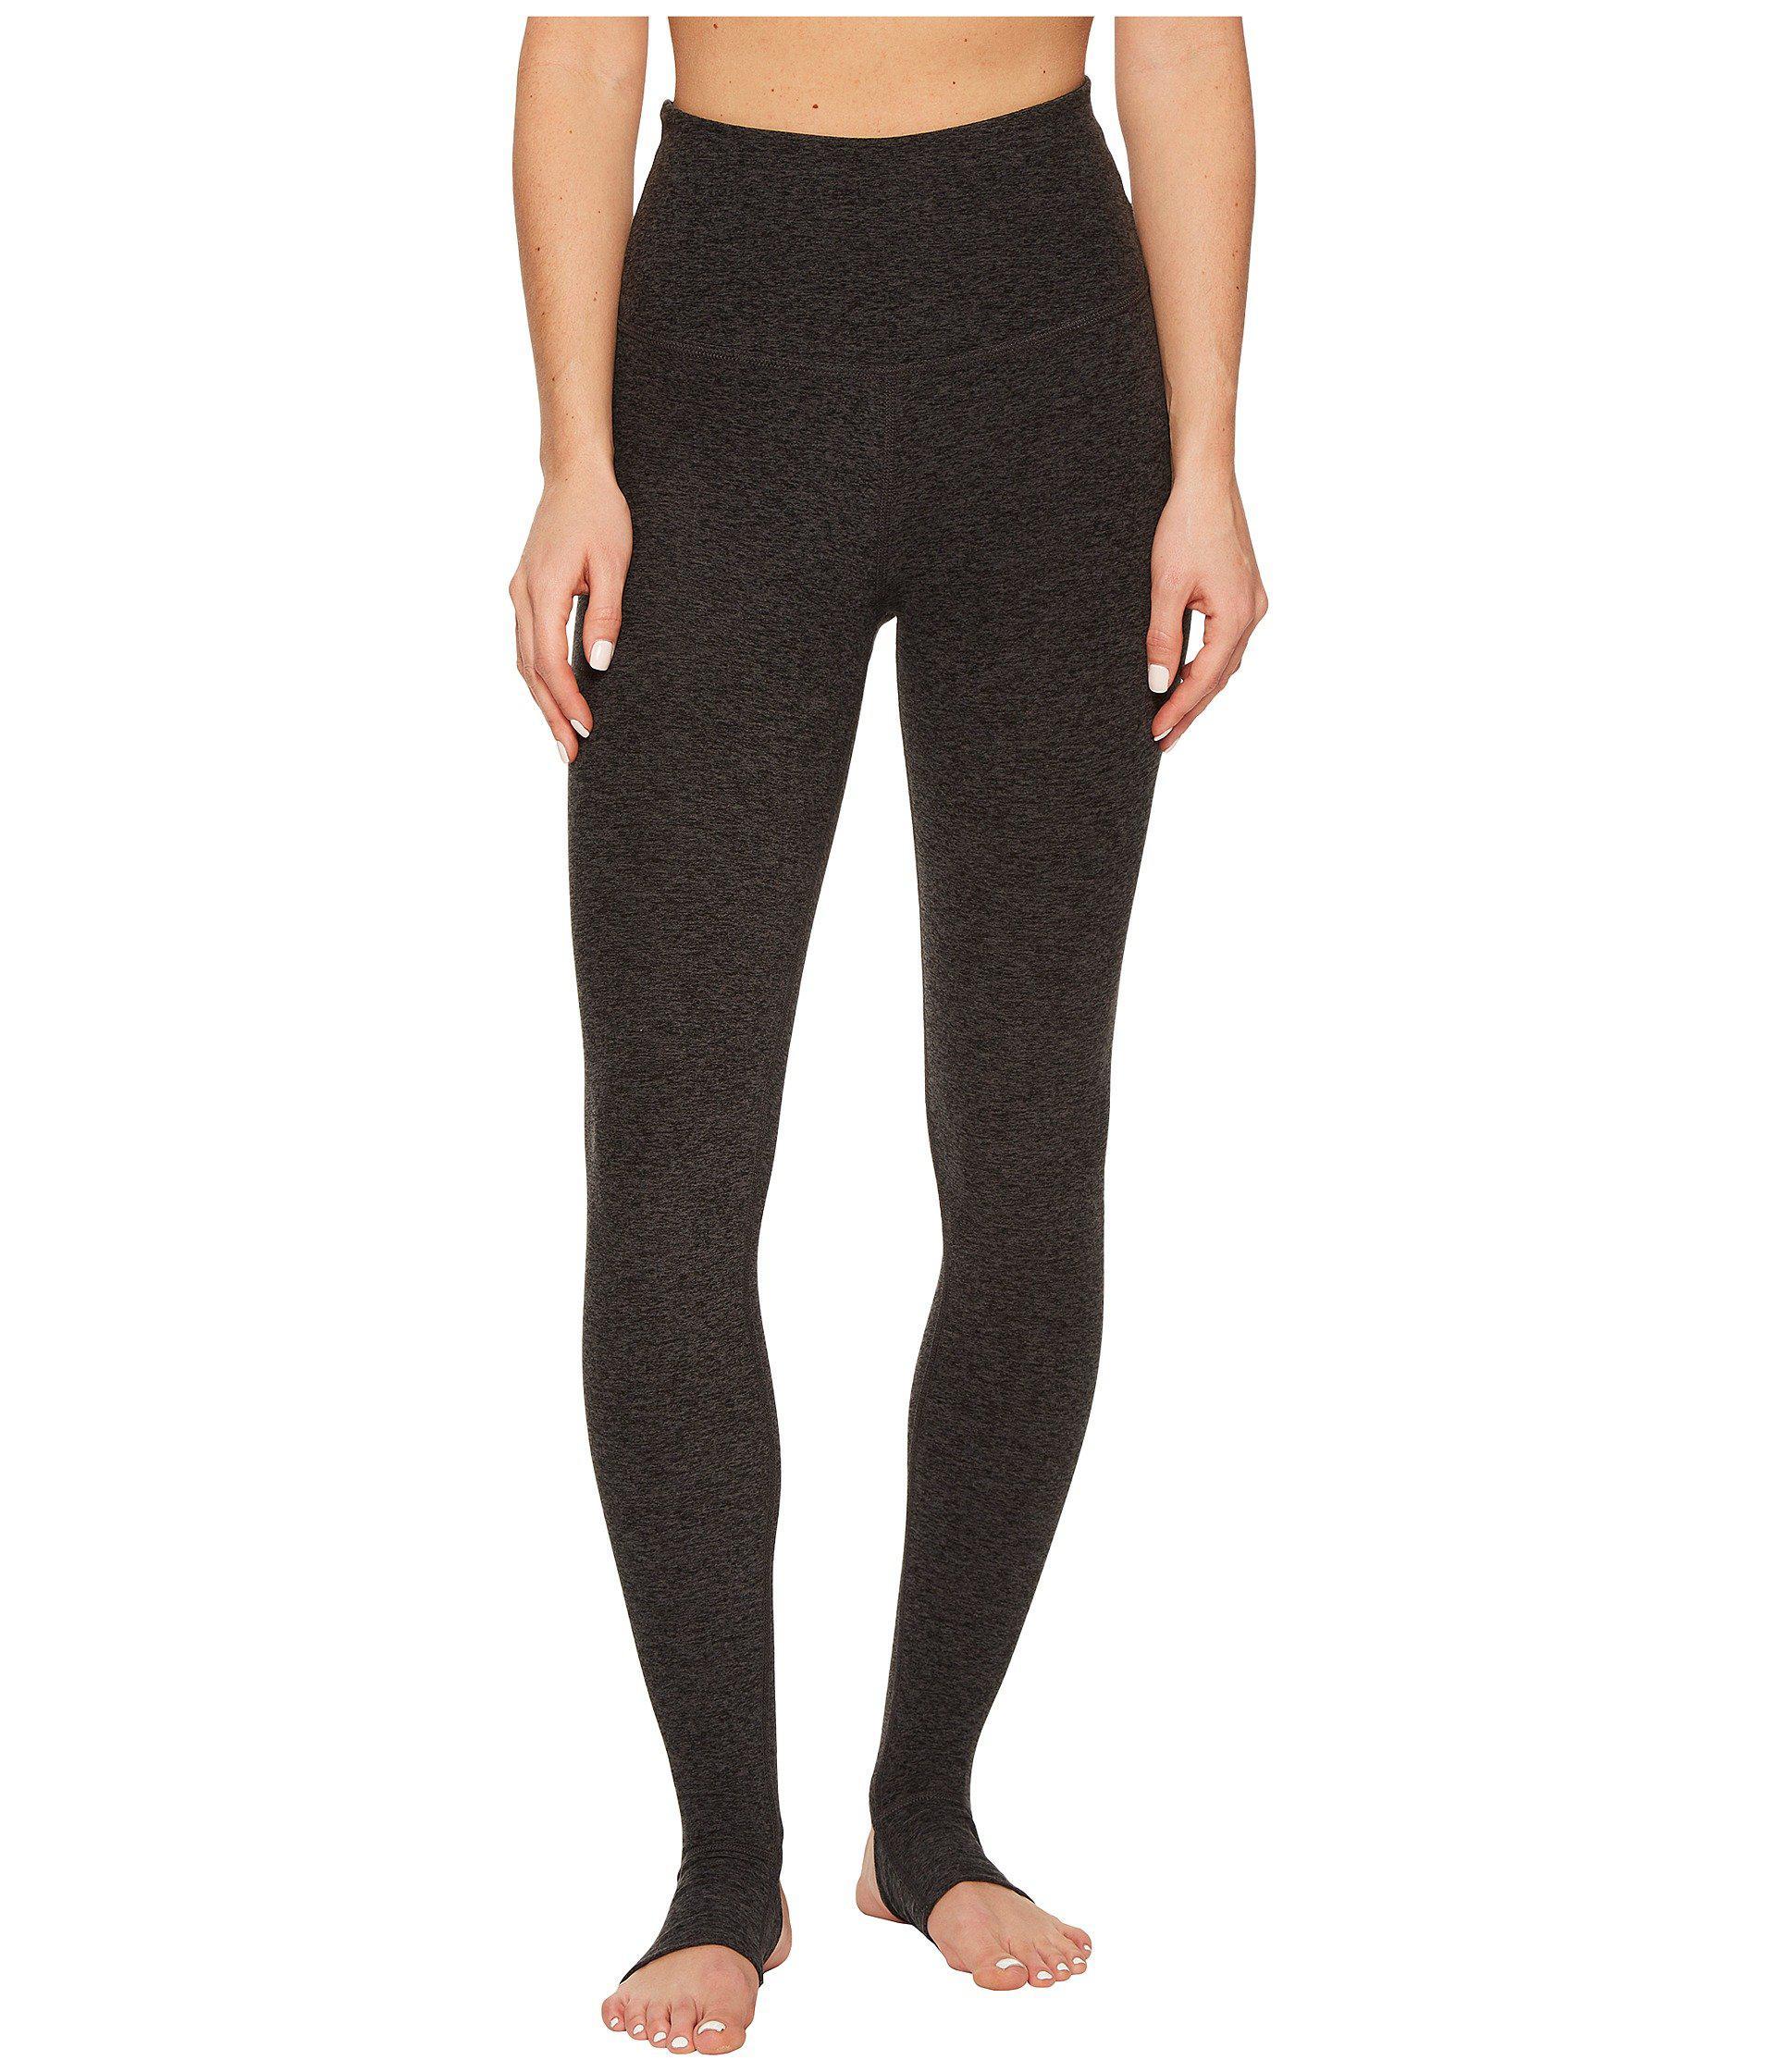 c508e419cea0f Lyst - Beyond Yoga High Waist Stirrup Leggings (black/charcoal ...